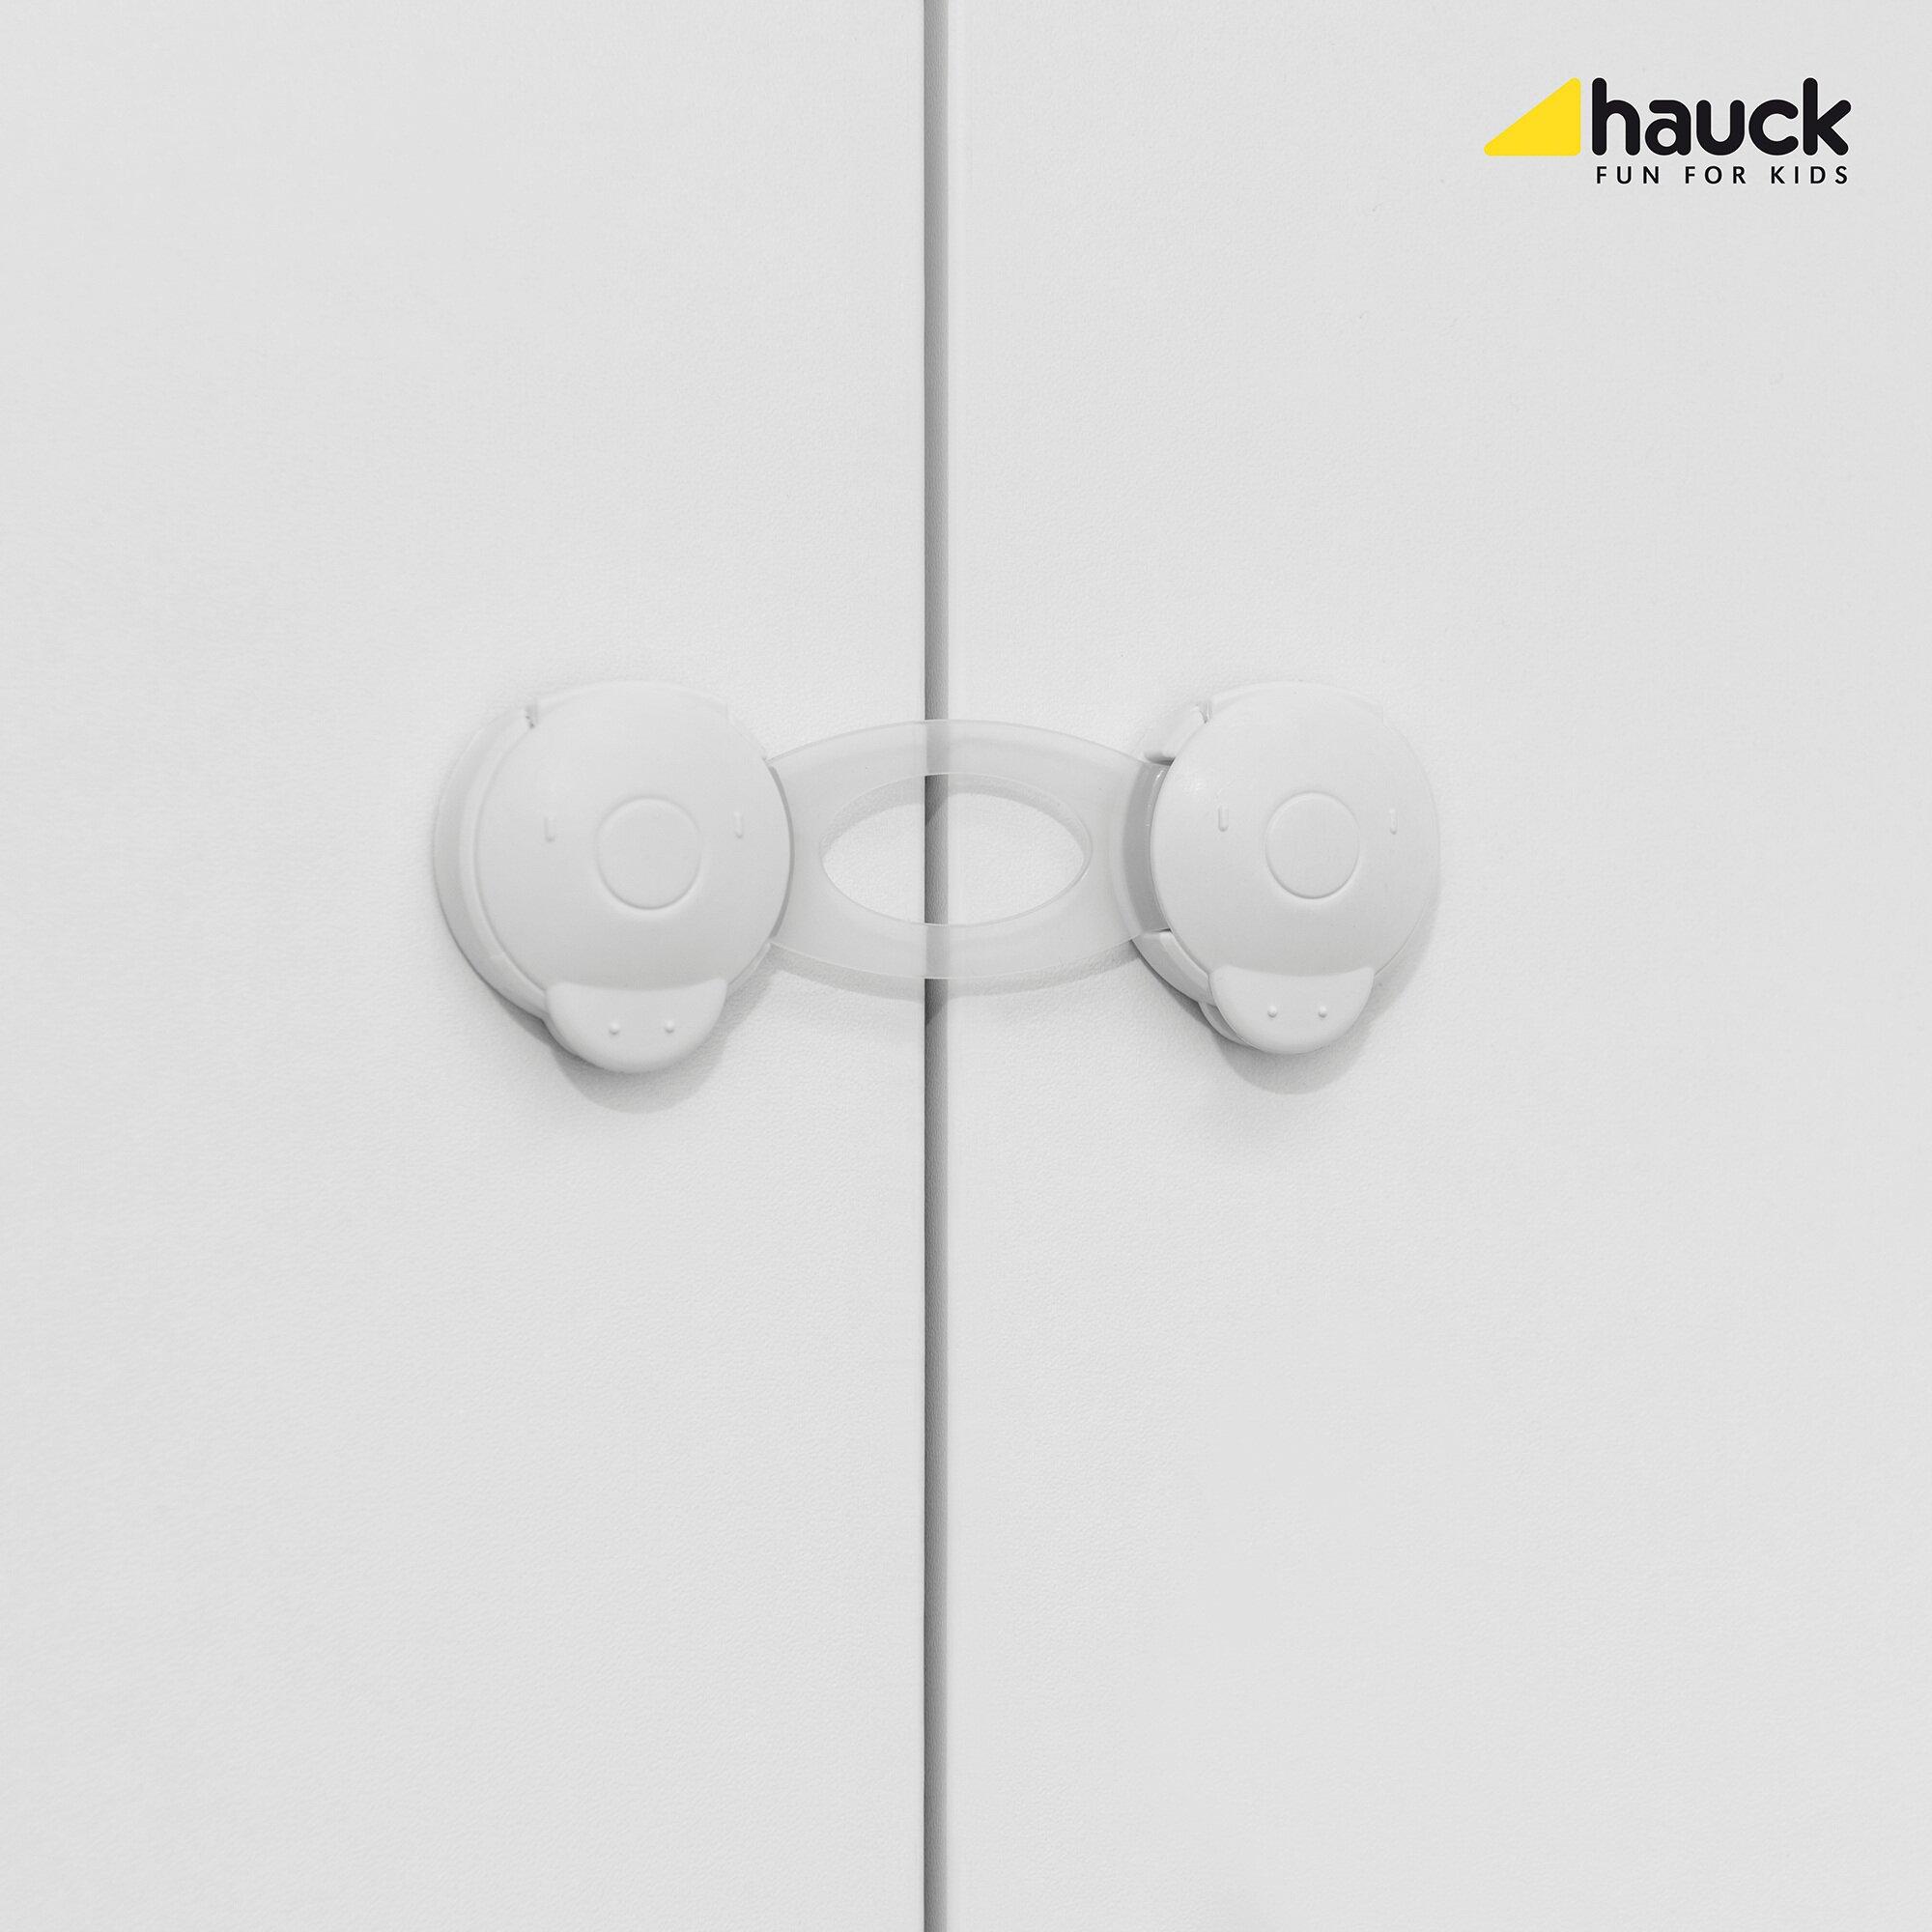 Hauck Türverschluss - Close Me - 2 Stück transparent